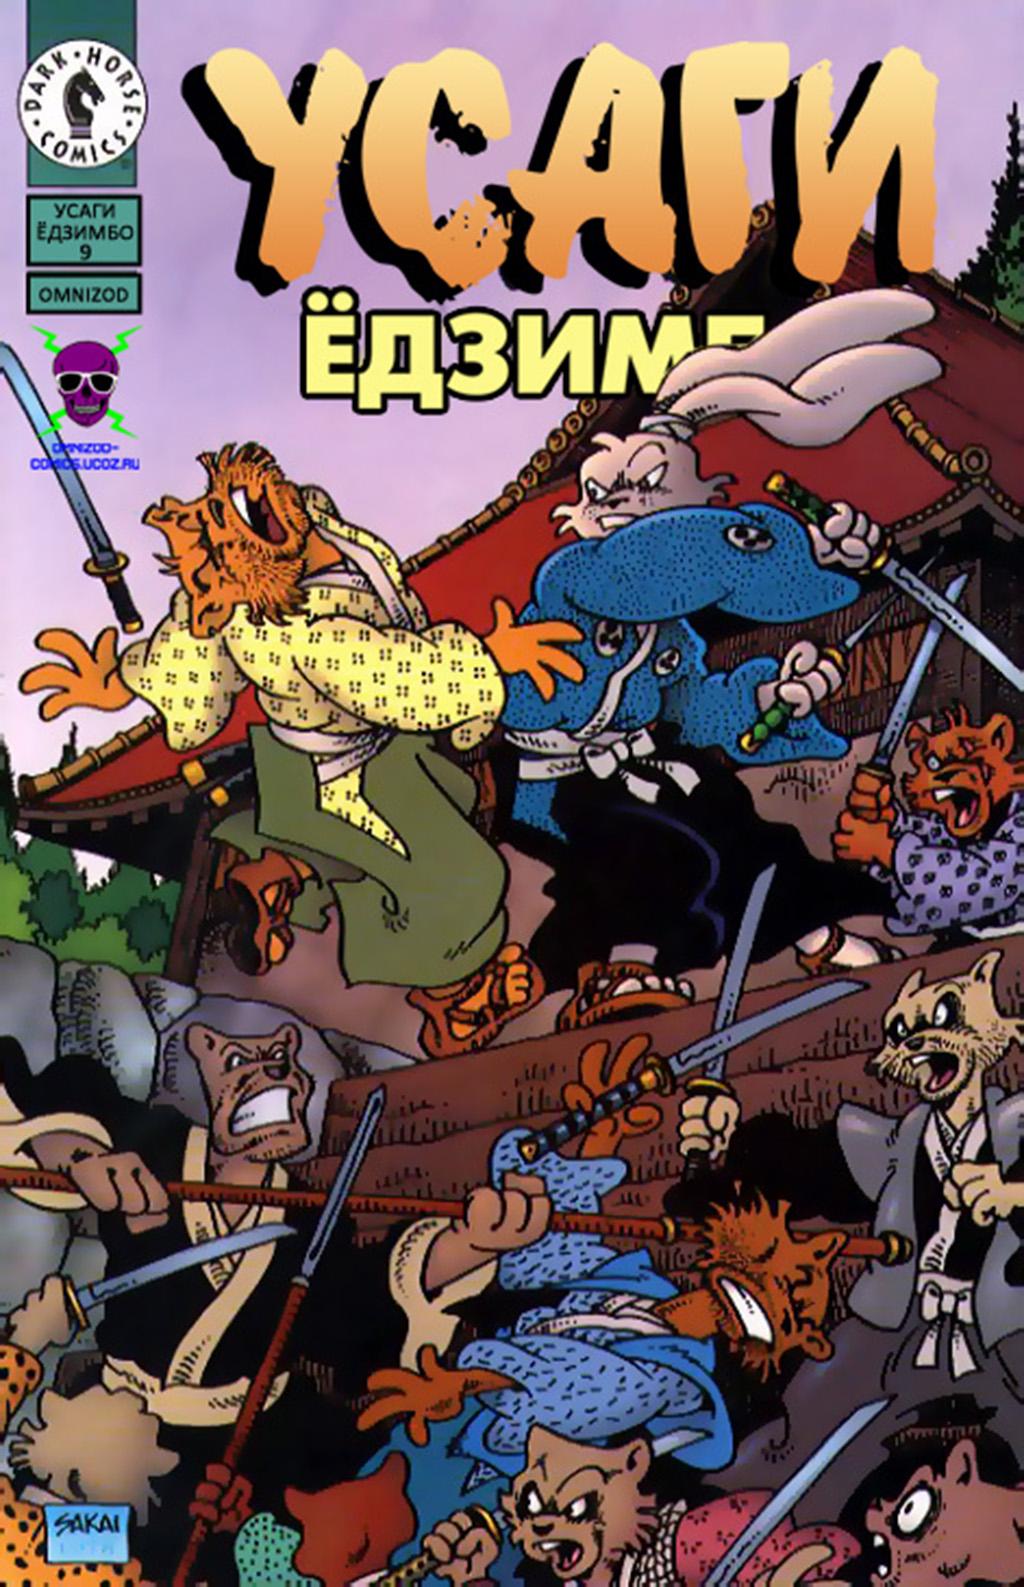 Комикс Усаги Ёдзимбо том 3